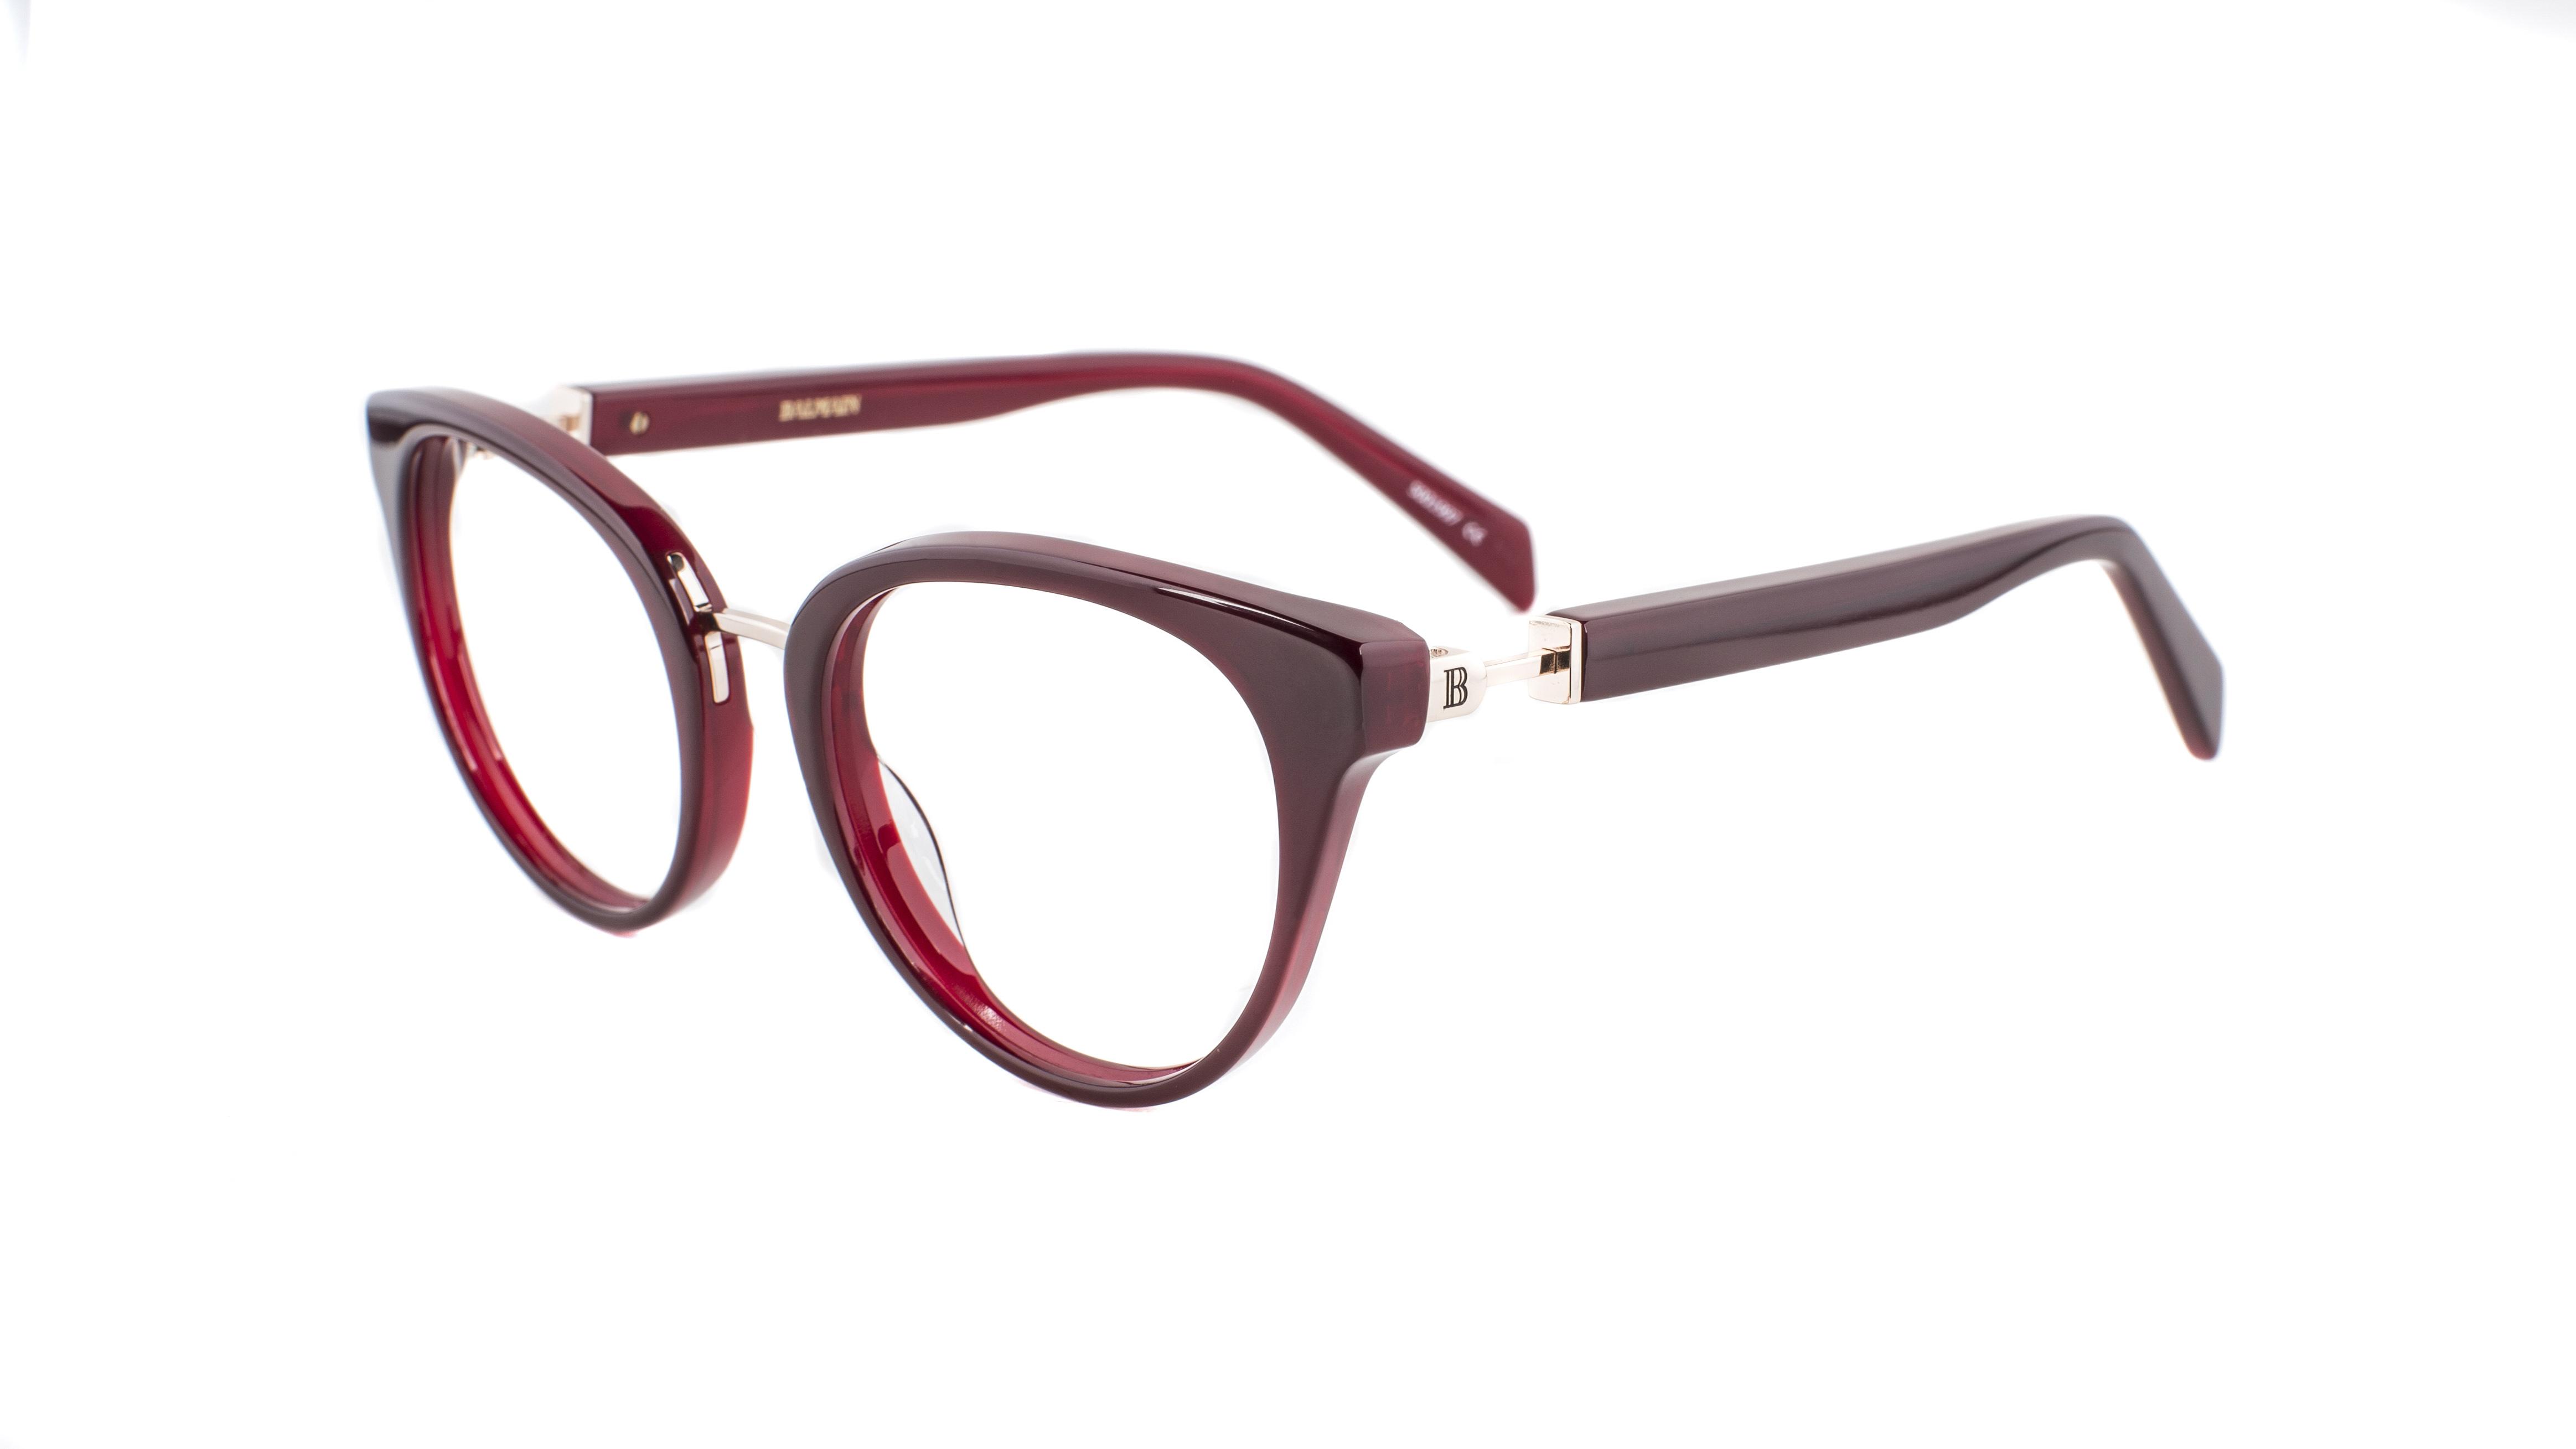 Balmain x Specsavers BL1084S 30571310 - RRP 2 pairs single vision $459